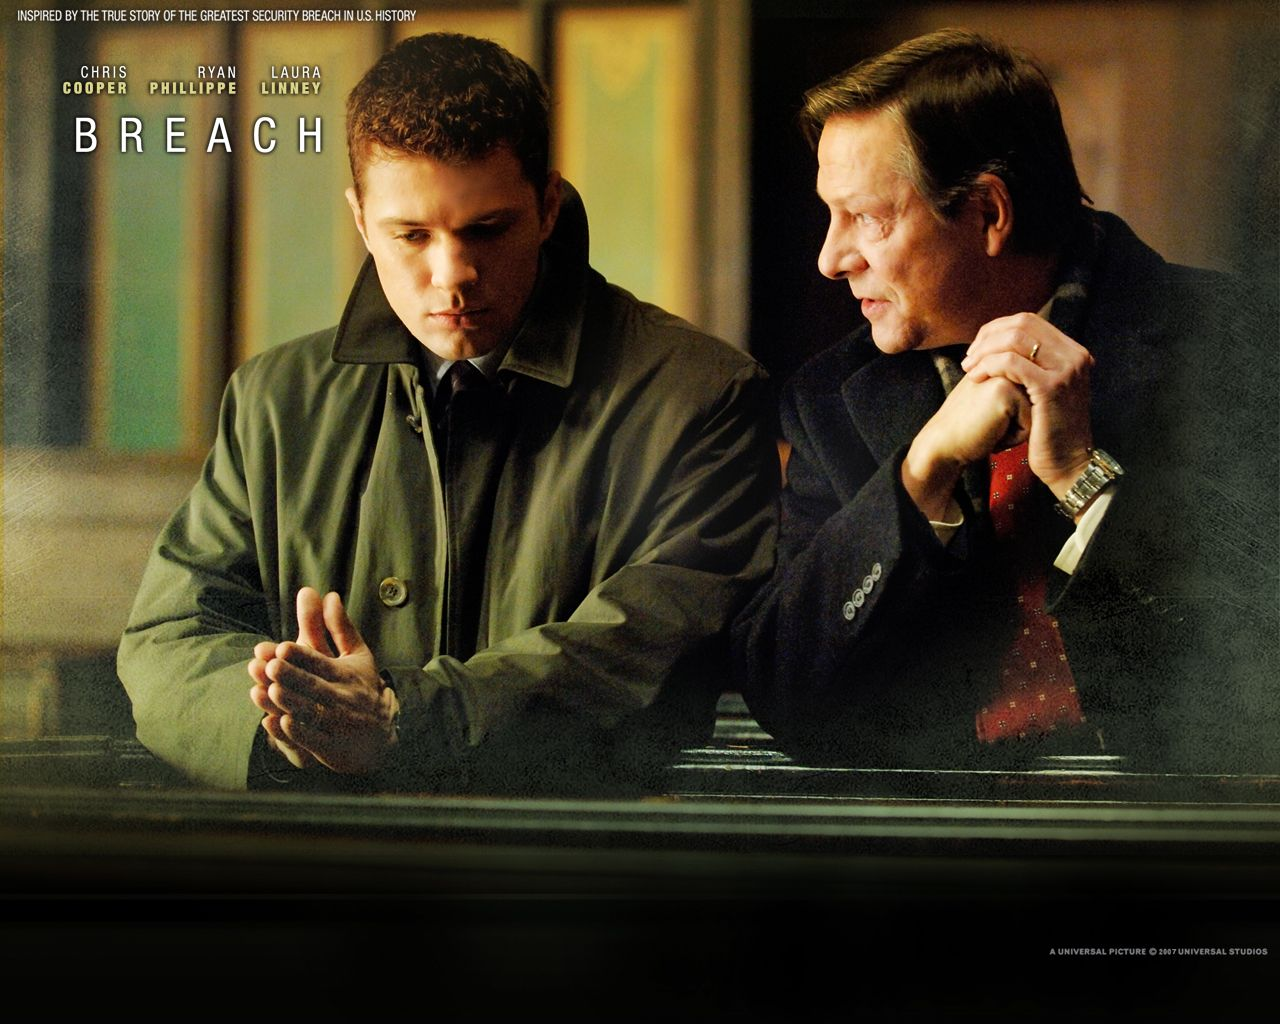 Watch Streaming Hd Breach Starring Chris Cooper Ryan Phillippe Dennis Haysbert Laura Linney Based On The True Story F Movies Movie Genres Dennis Haysbert